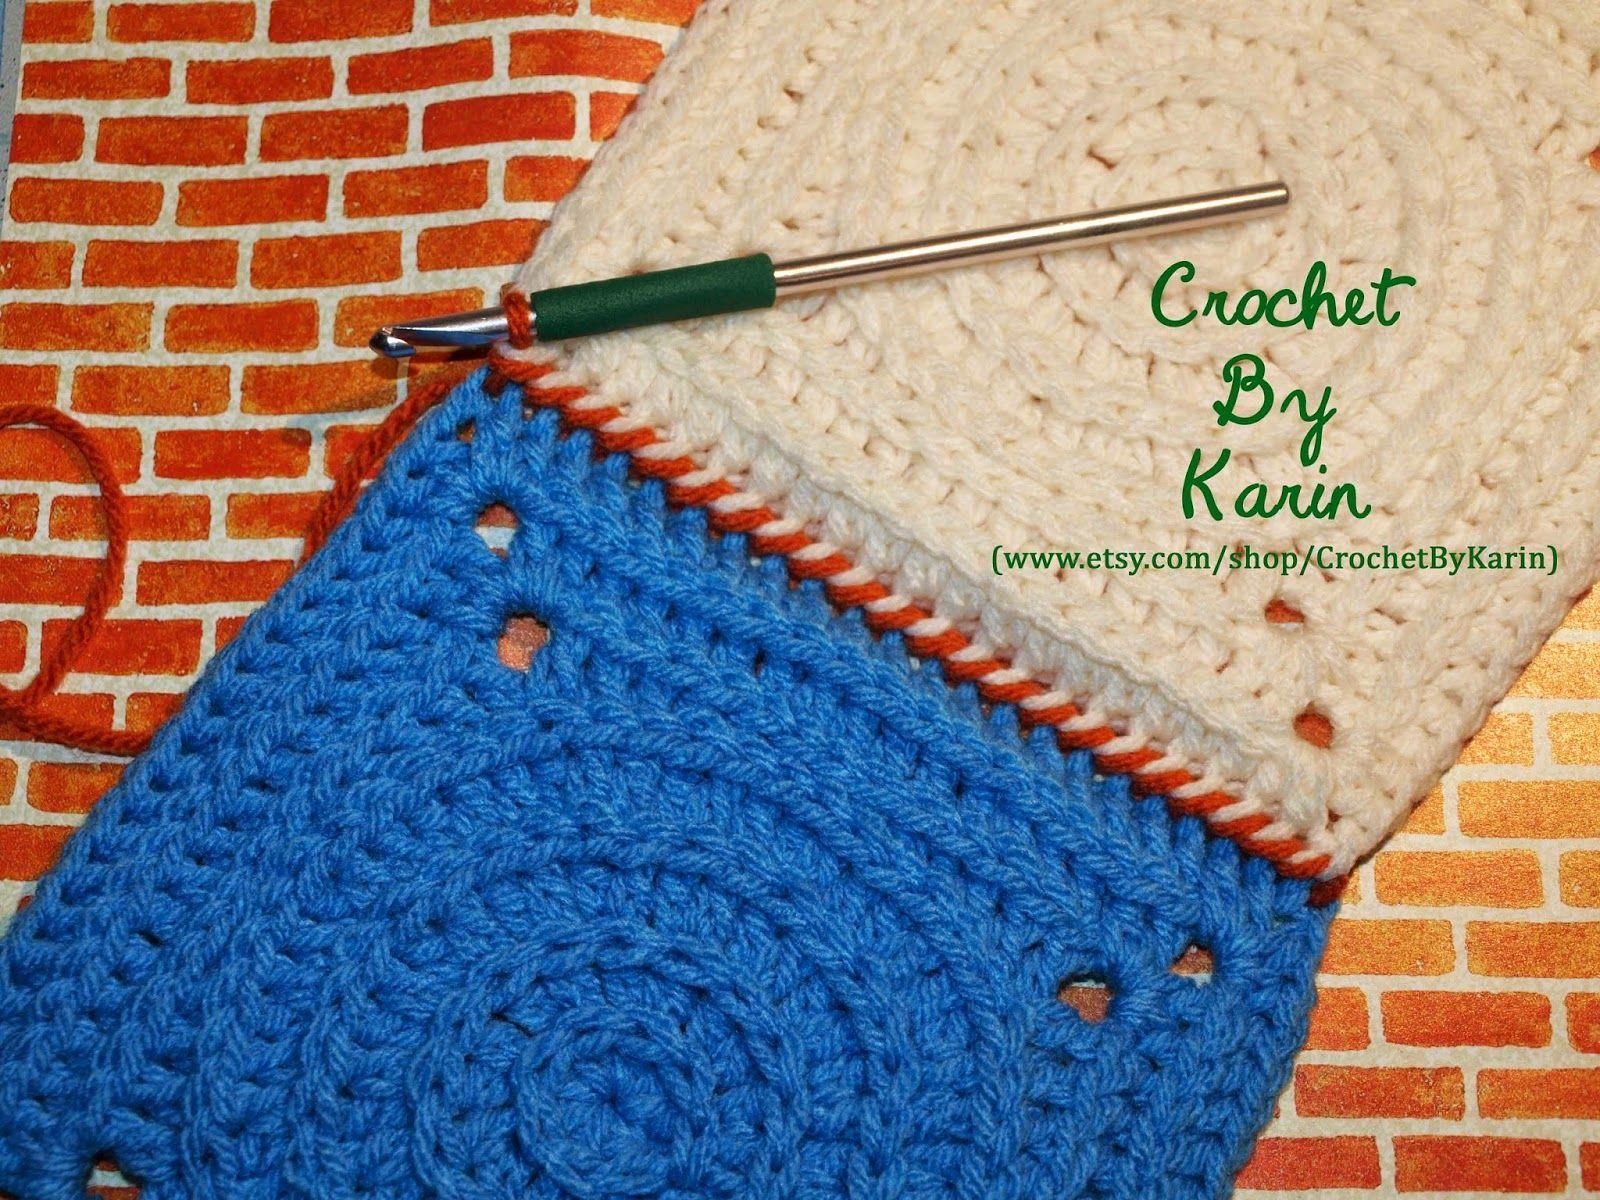 CrochetByKarin: Slip Stitch Crochet Connection | Free Crochet ...